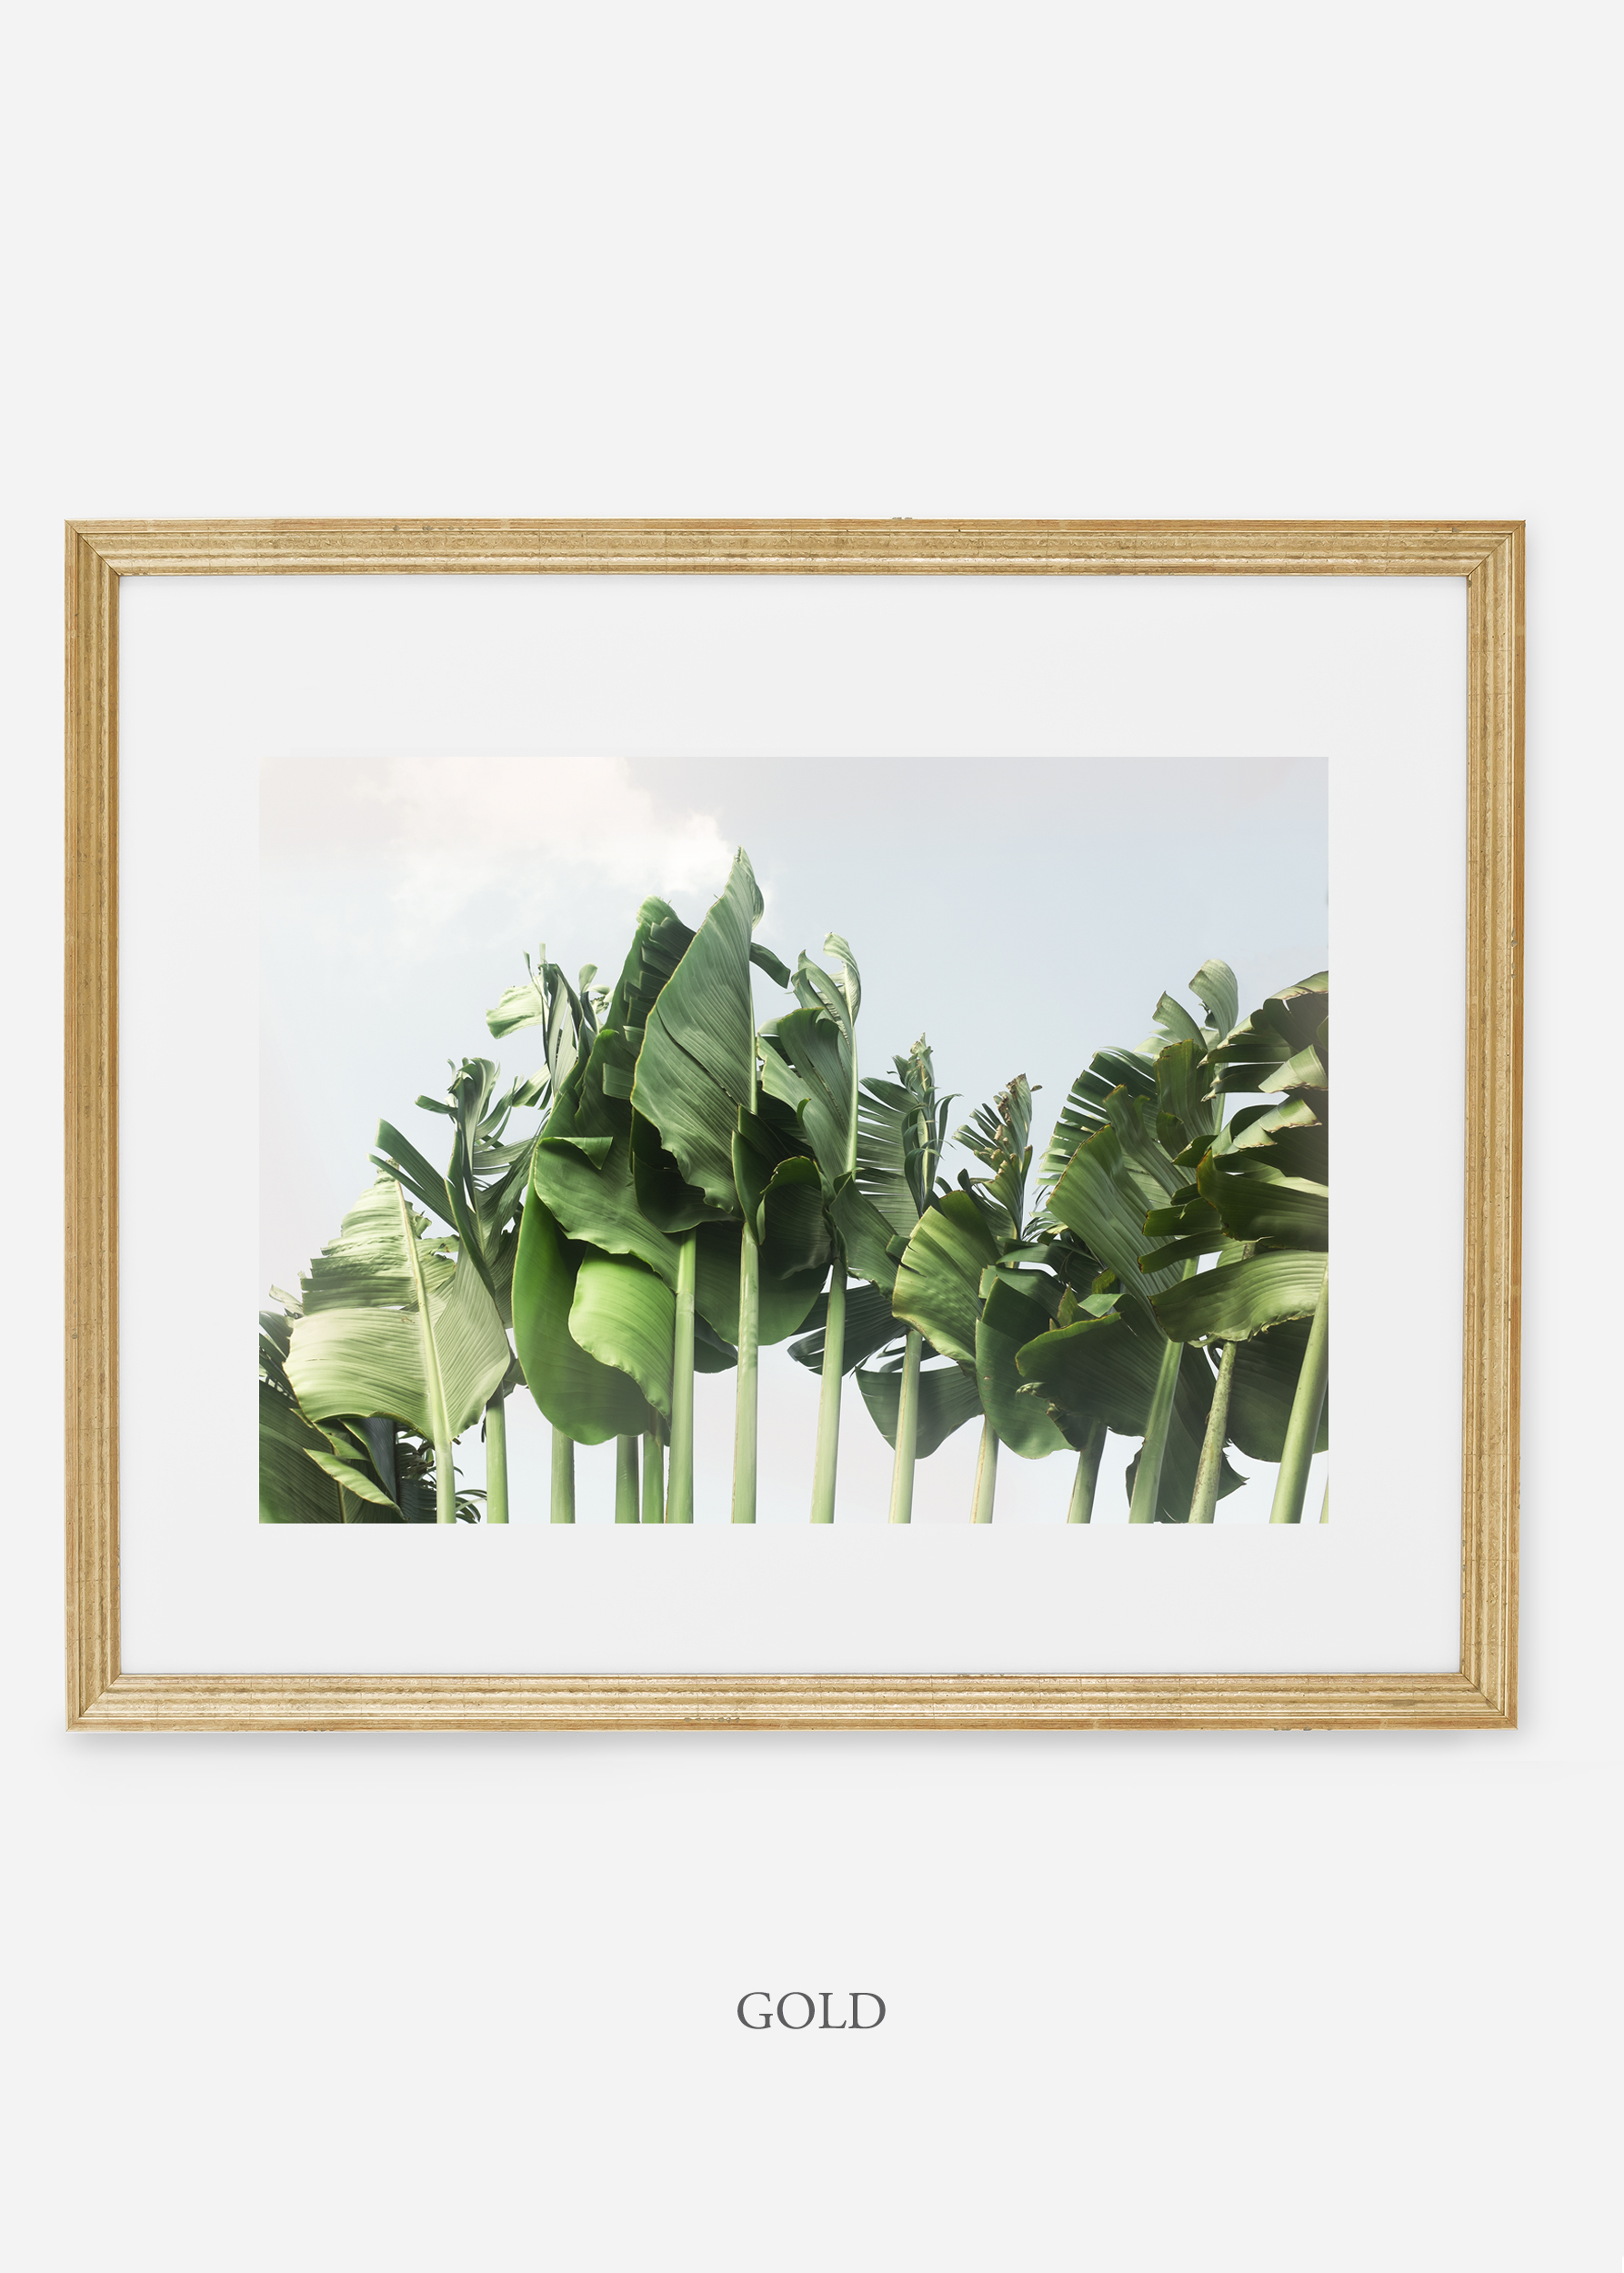 wildercalifornia_goldframe_tulum_bananaleaf_No.1_minimal_cactus_art_interiordesign_blackandwhite.jpg